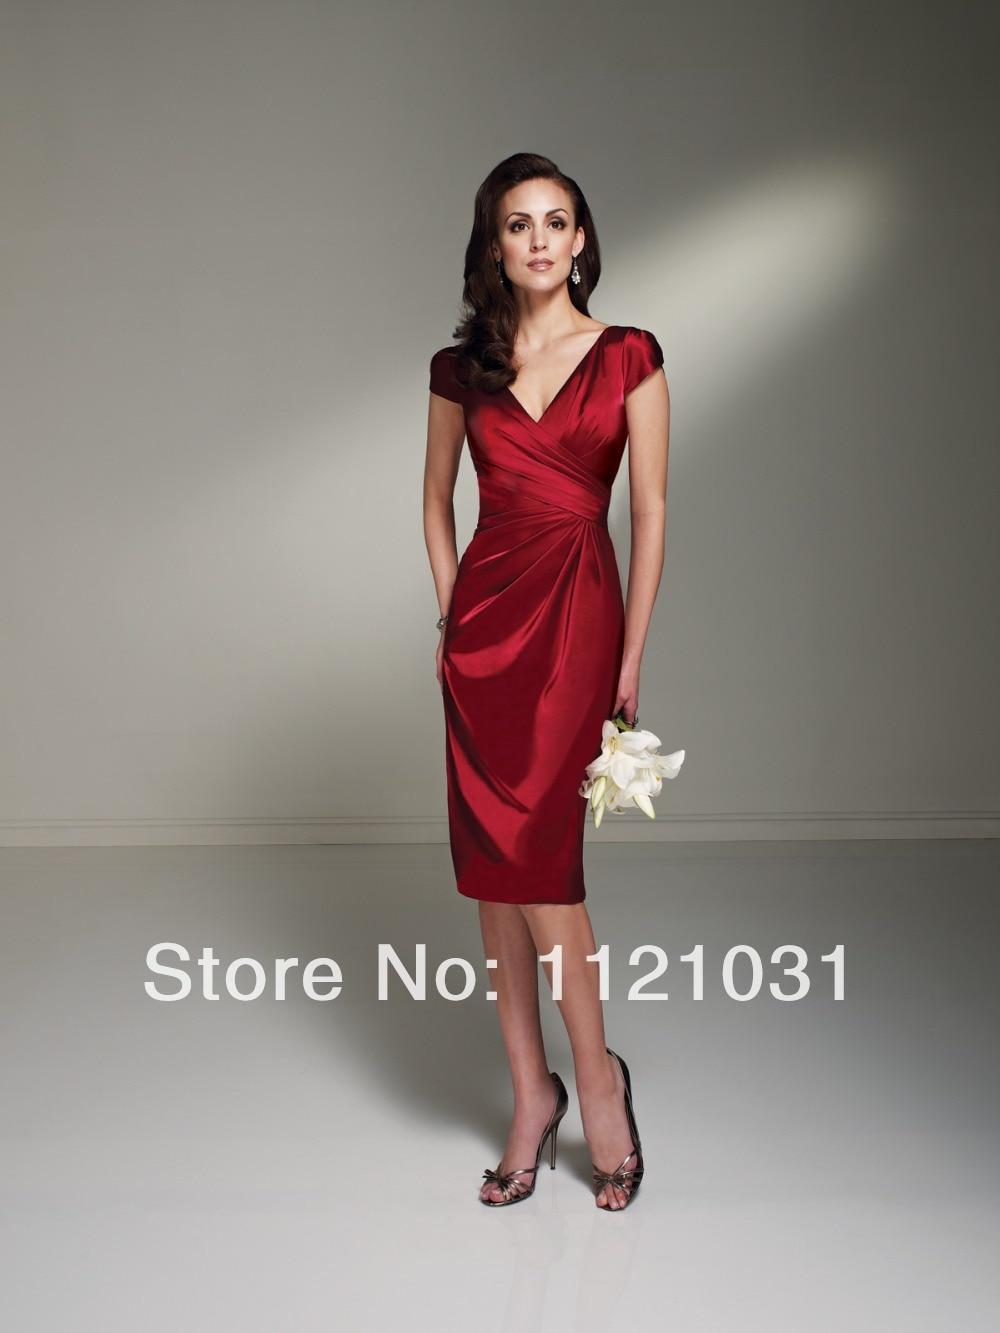 2019 New Red Elegant Sheath V Neck Cap Sleeve Taffeta vestido de noiva cheap short Mother of the Bride Dresses Custom-made